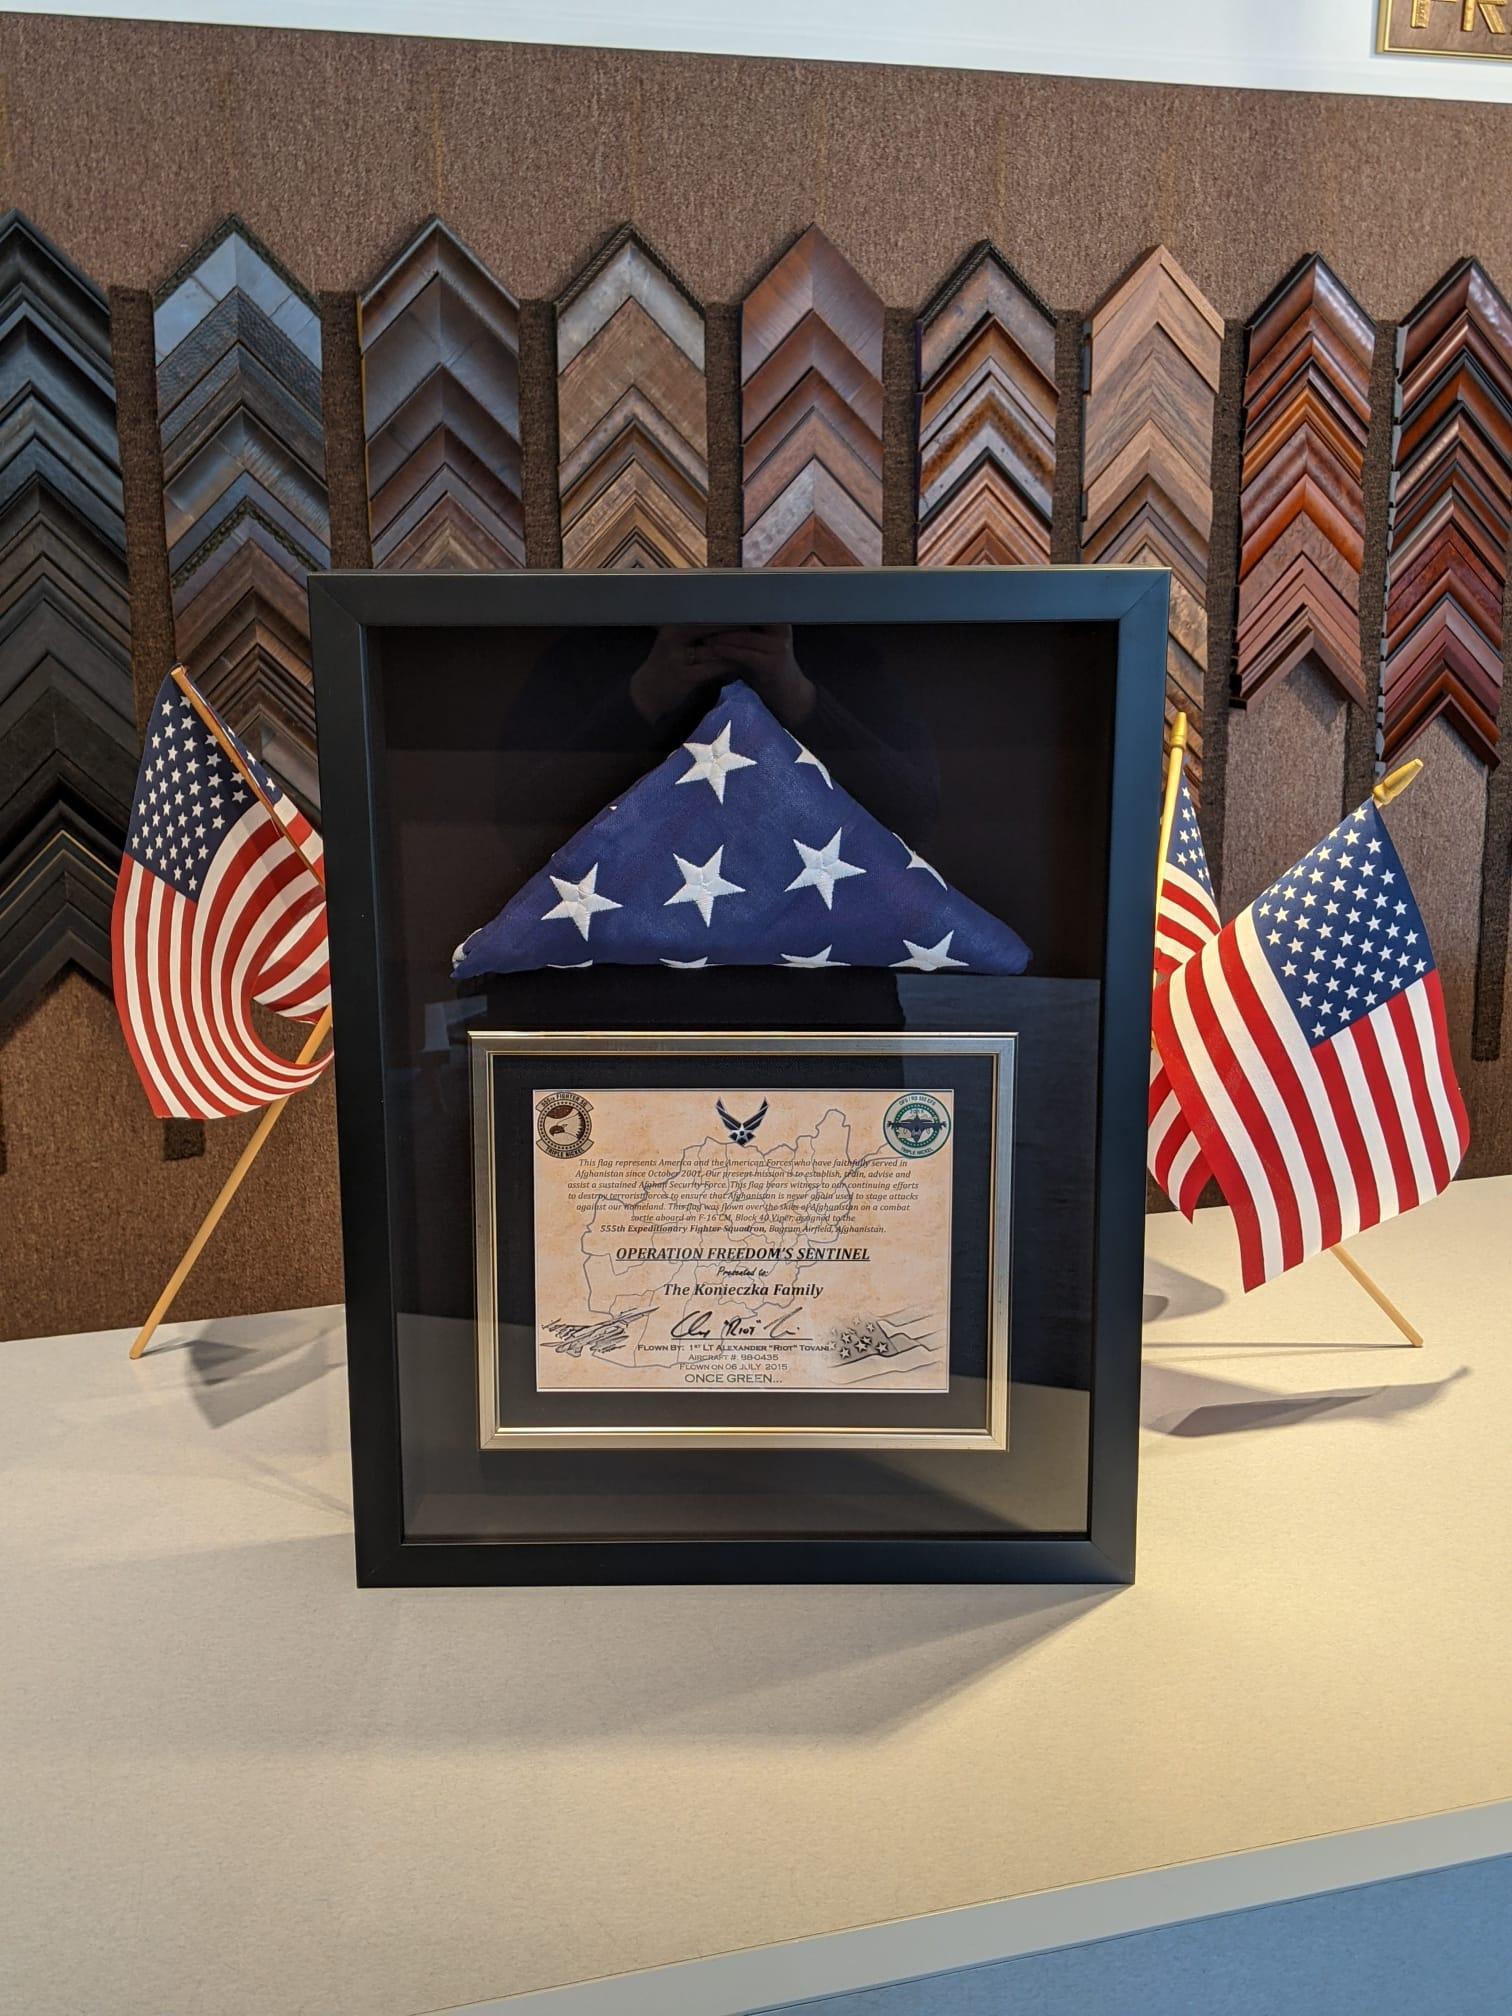 U.S.A. flag framed by The Framemakers